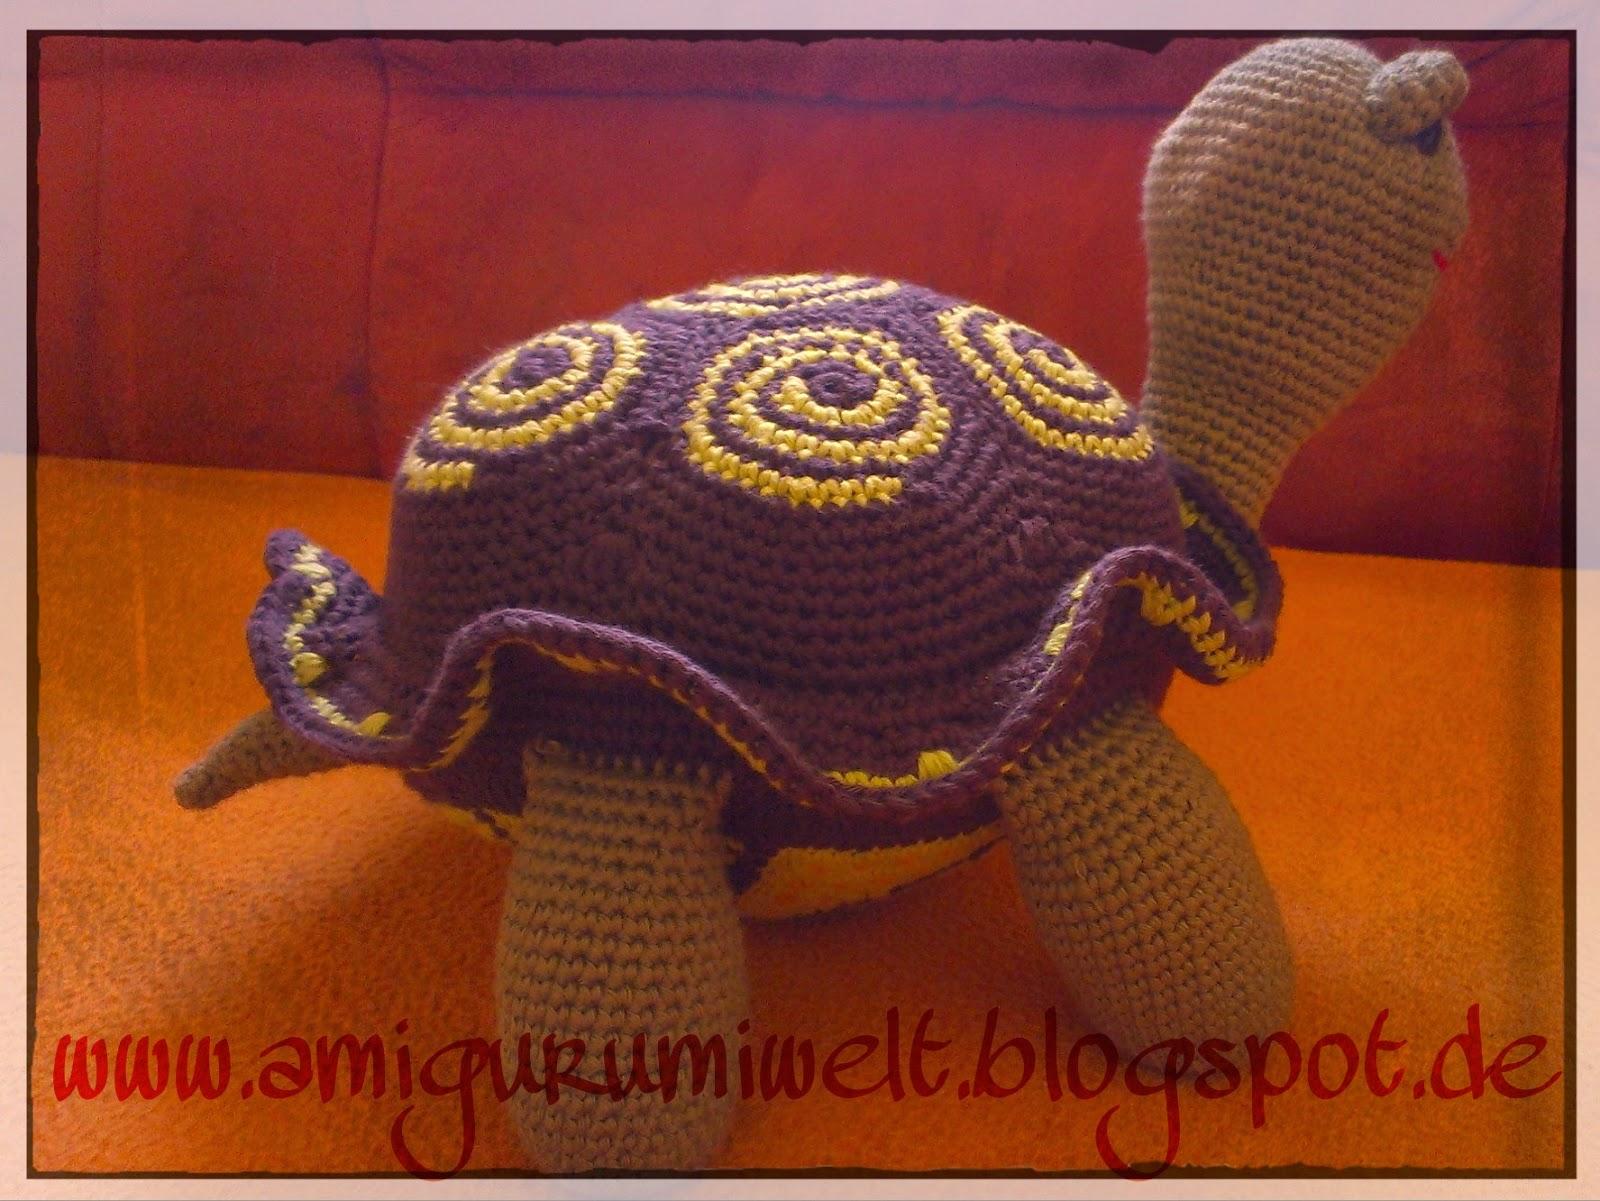 Wundervolle Amigurumi Welt Sato Die Schildkröte